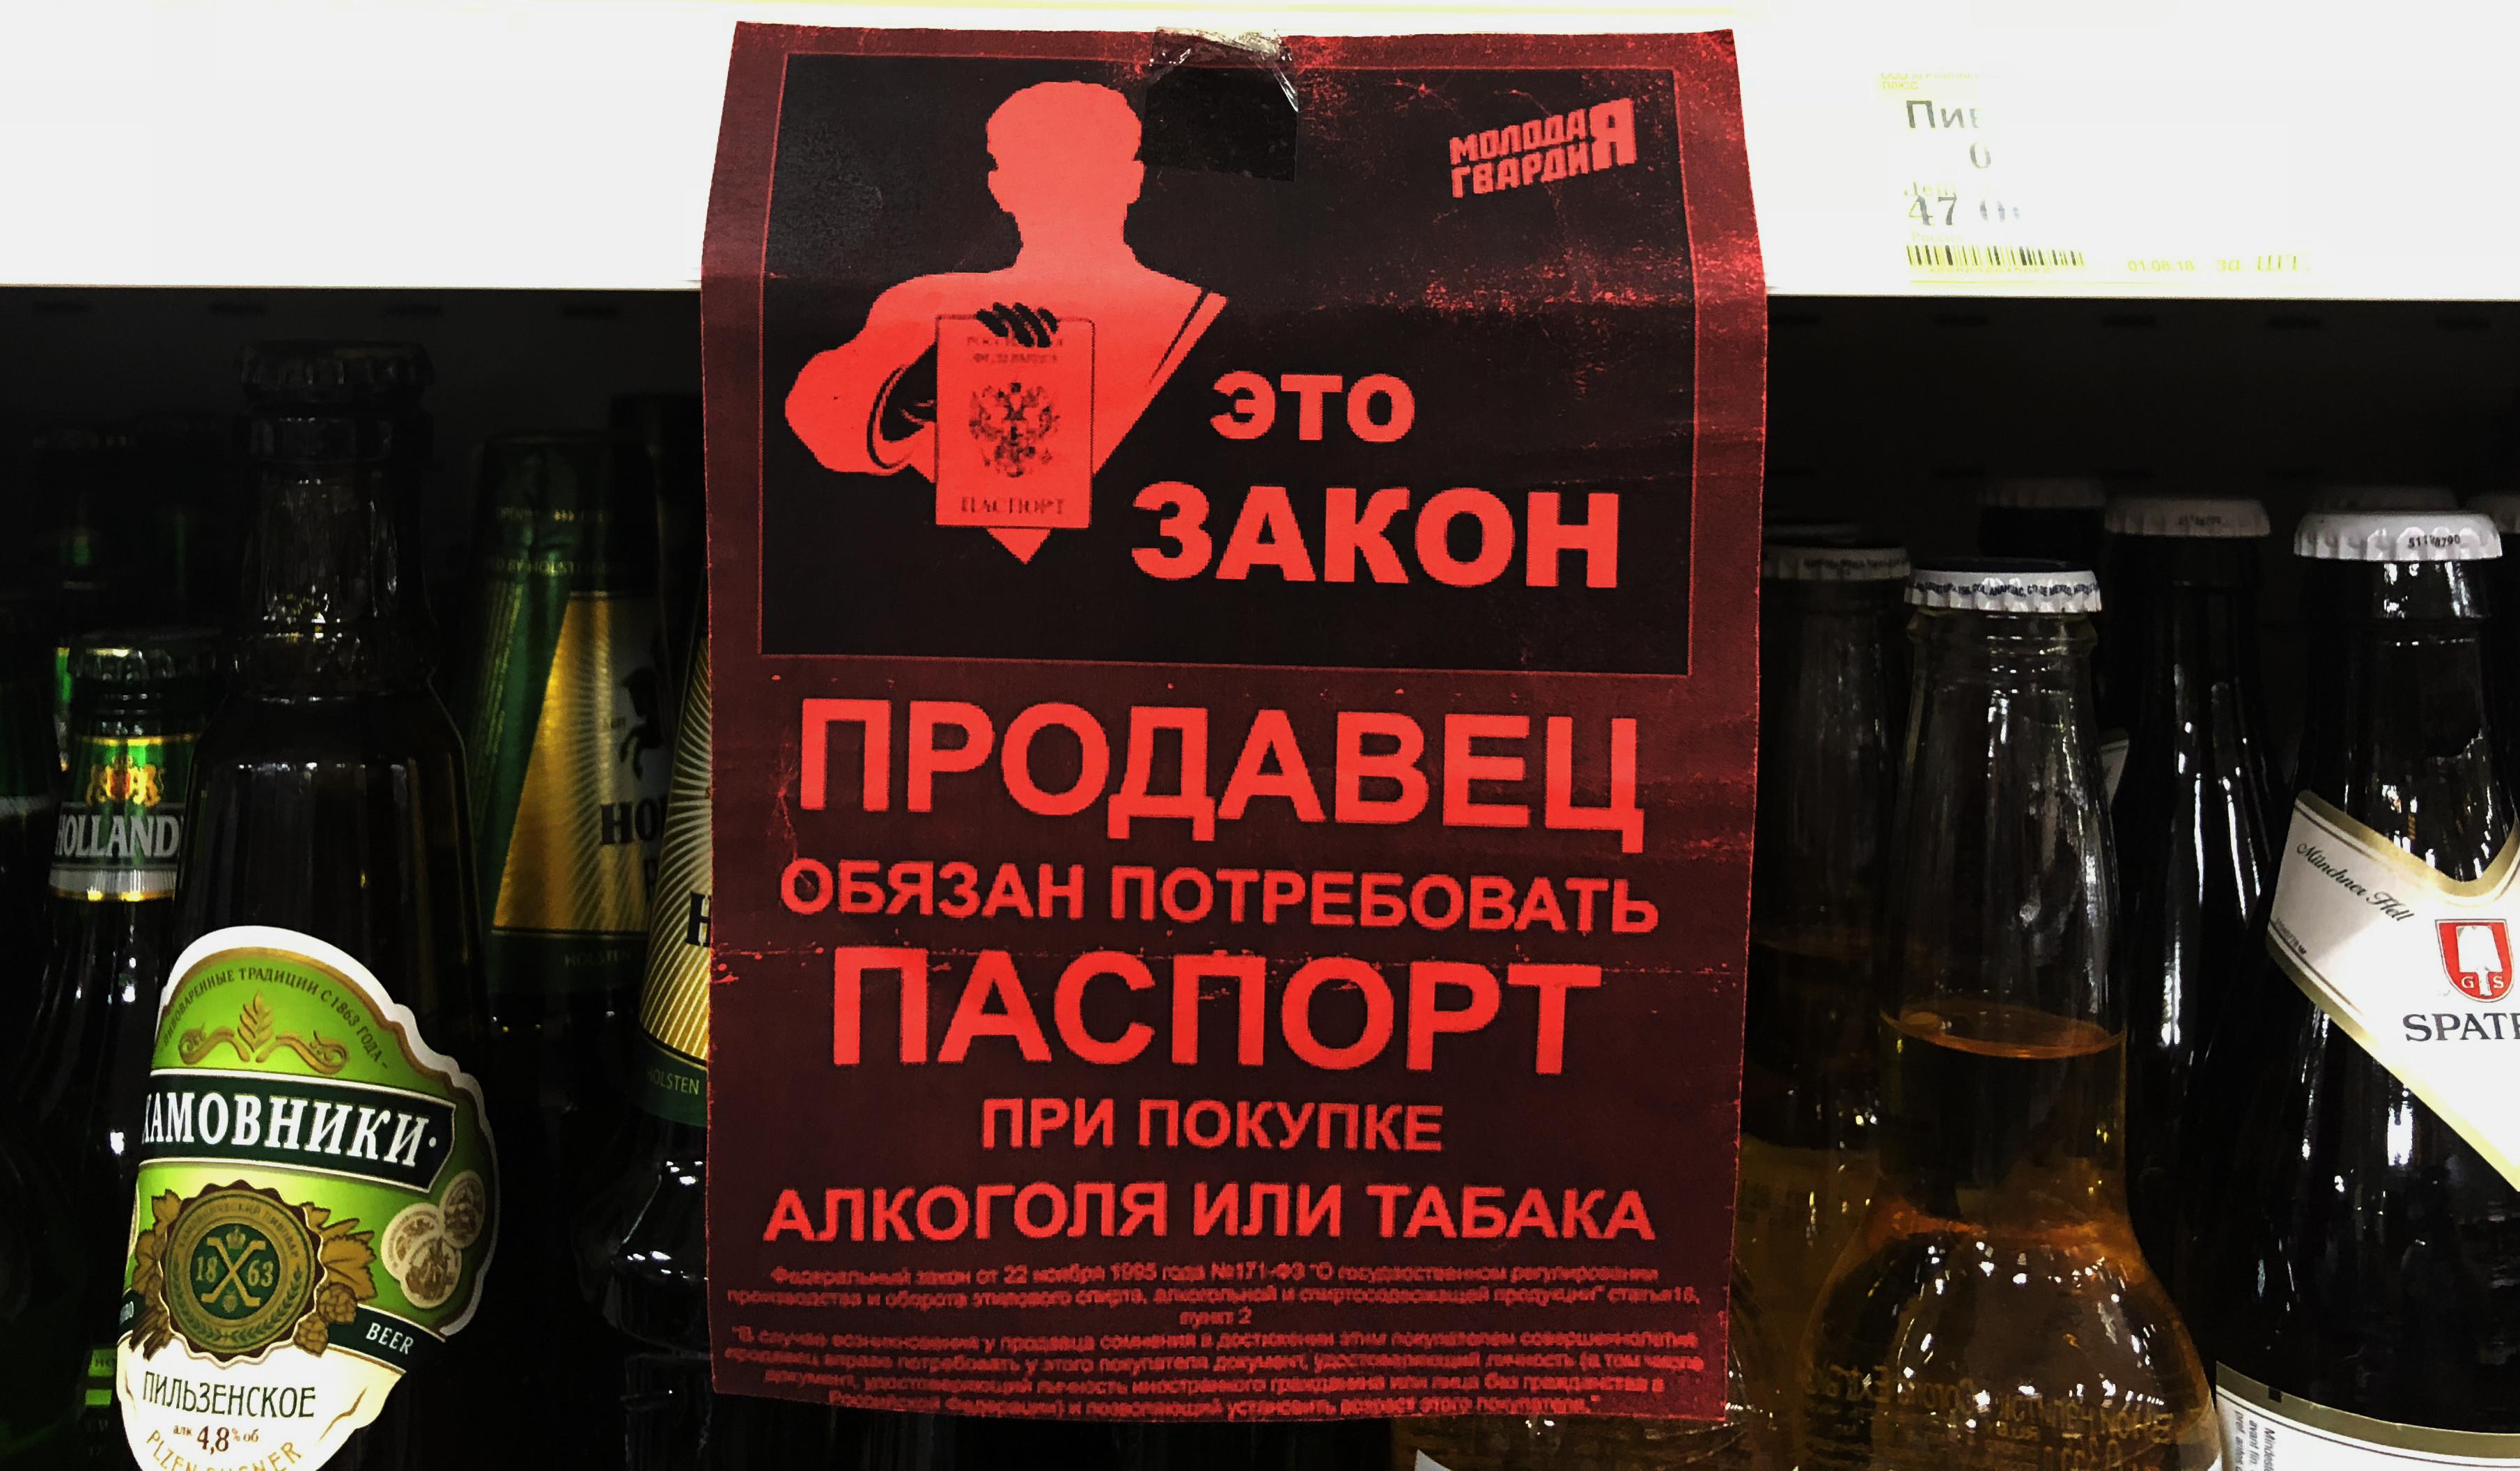 <p>Фото: &copy; РИА Новости / Наталья Селиверстова</p>